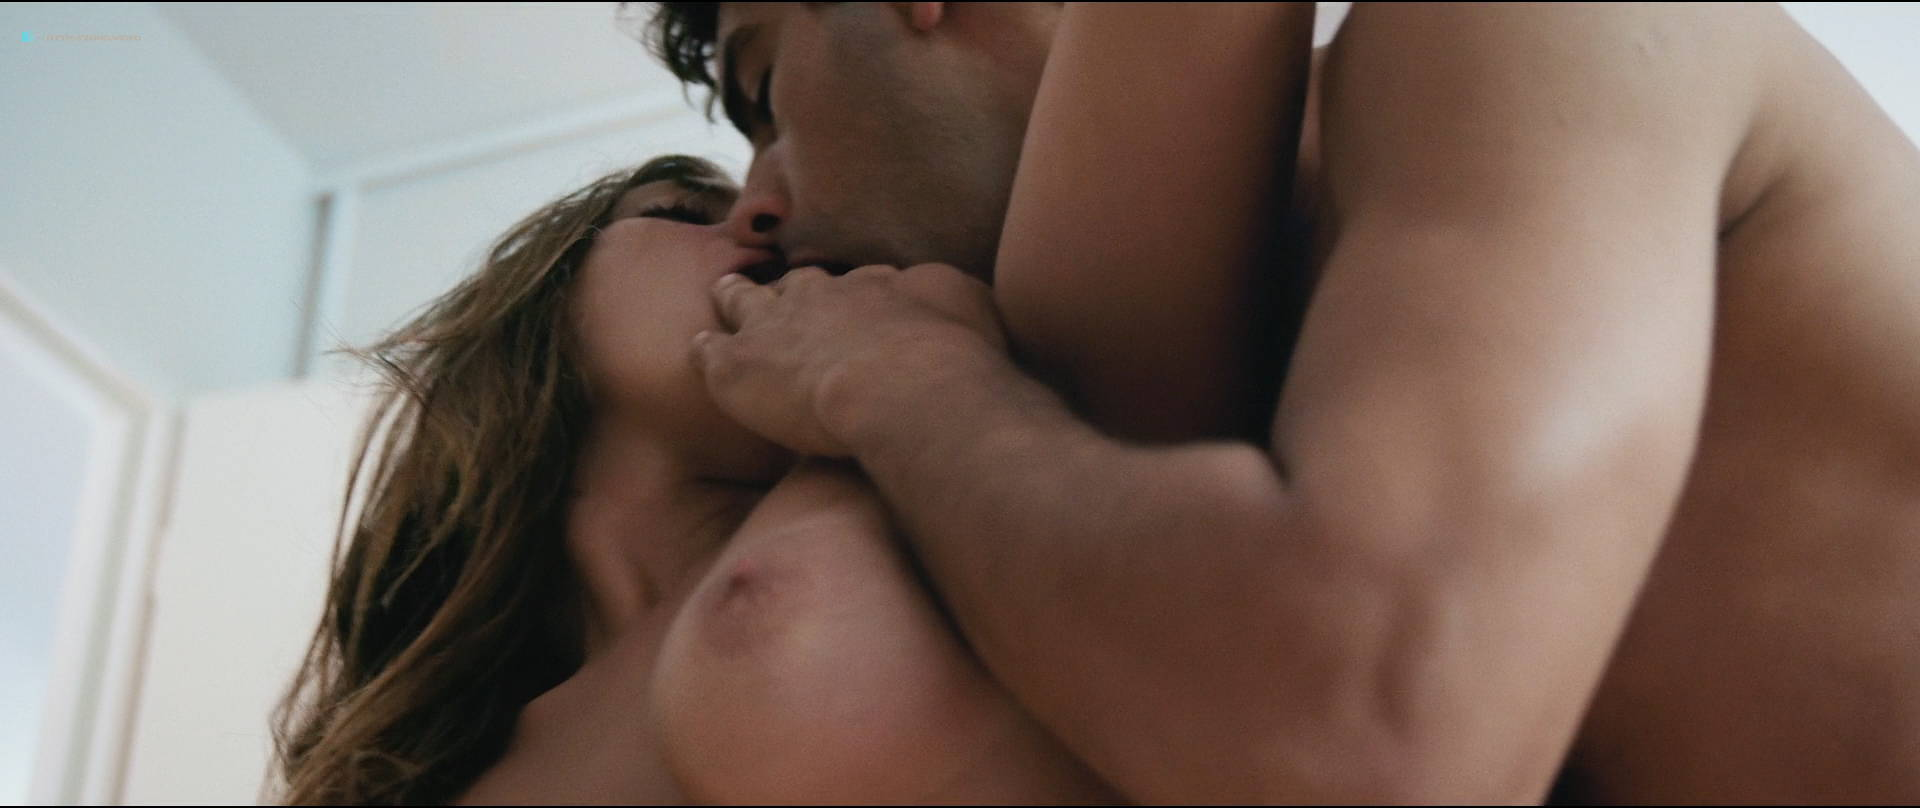 Ophélie Bau nude bush and hot sex - Mektoub, My Love: Canto Uno (FR-2017) HD 1080p BluRay (16)